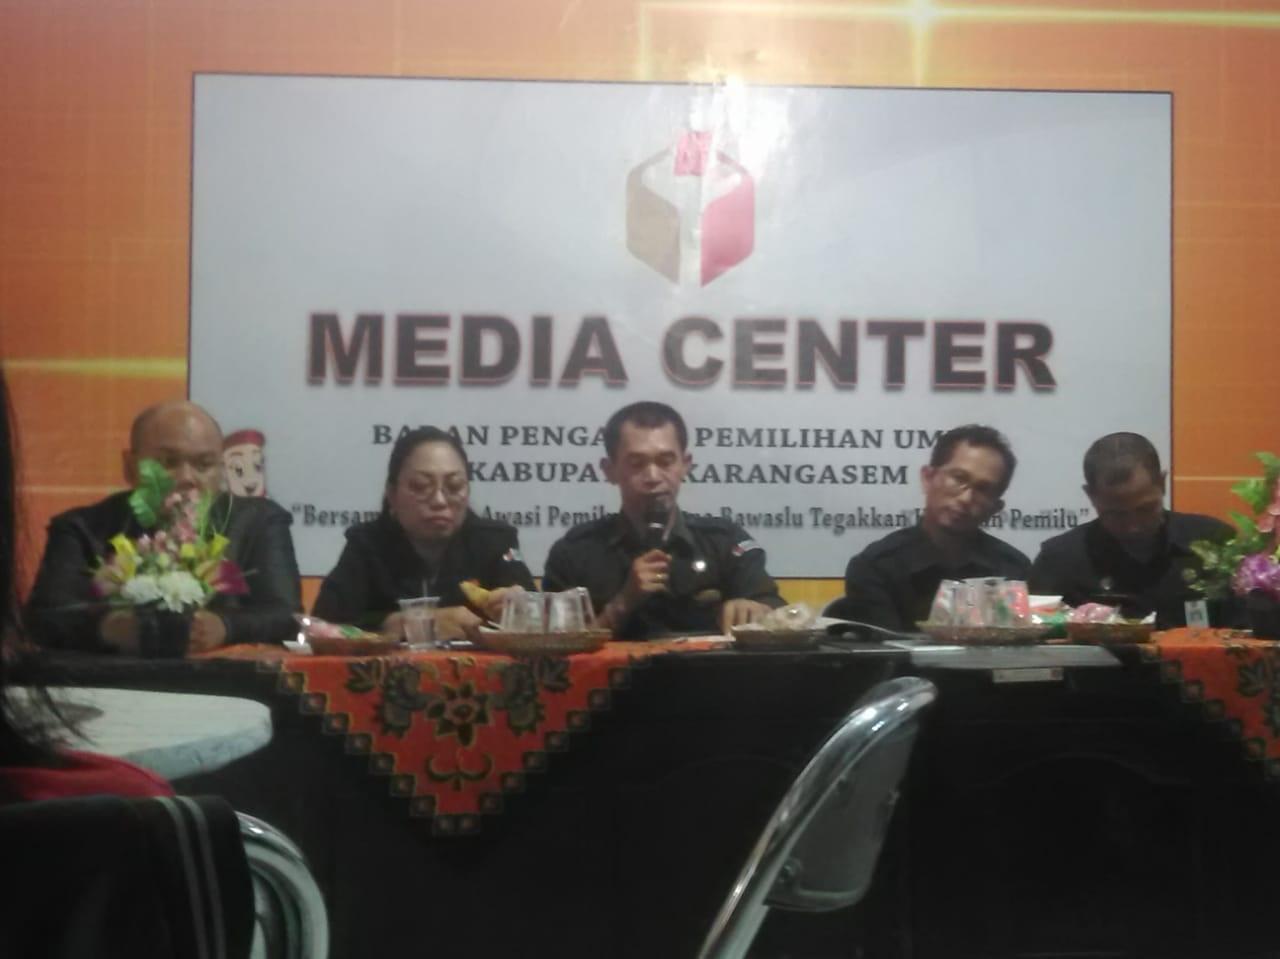 PEMBAHASAN Bawaslu Karangasem bersama wartawan terkait pilkada 2020 di Bawaslu Karangasem, Senin (24/2).